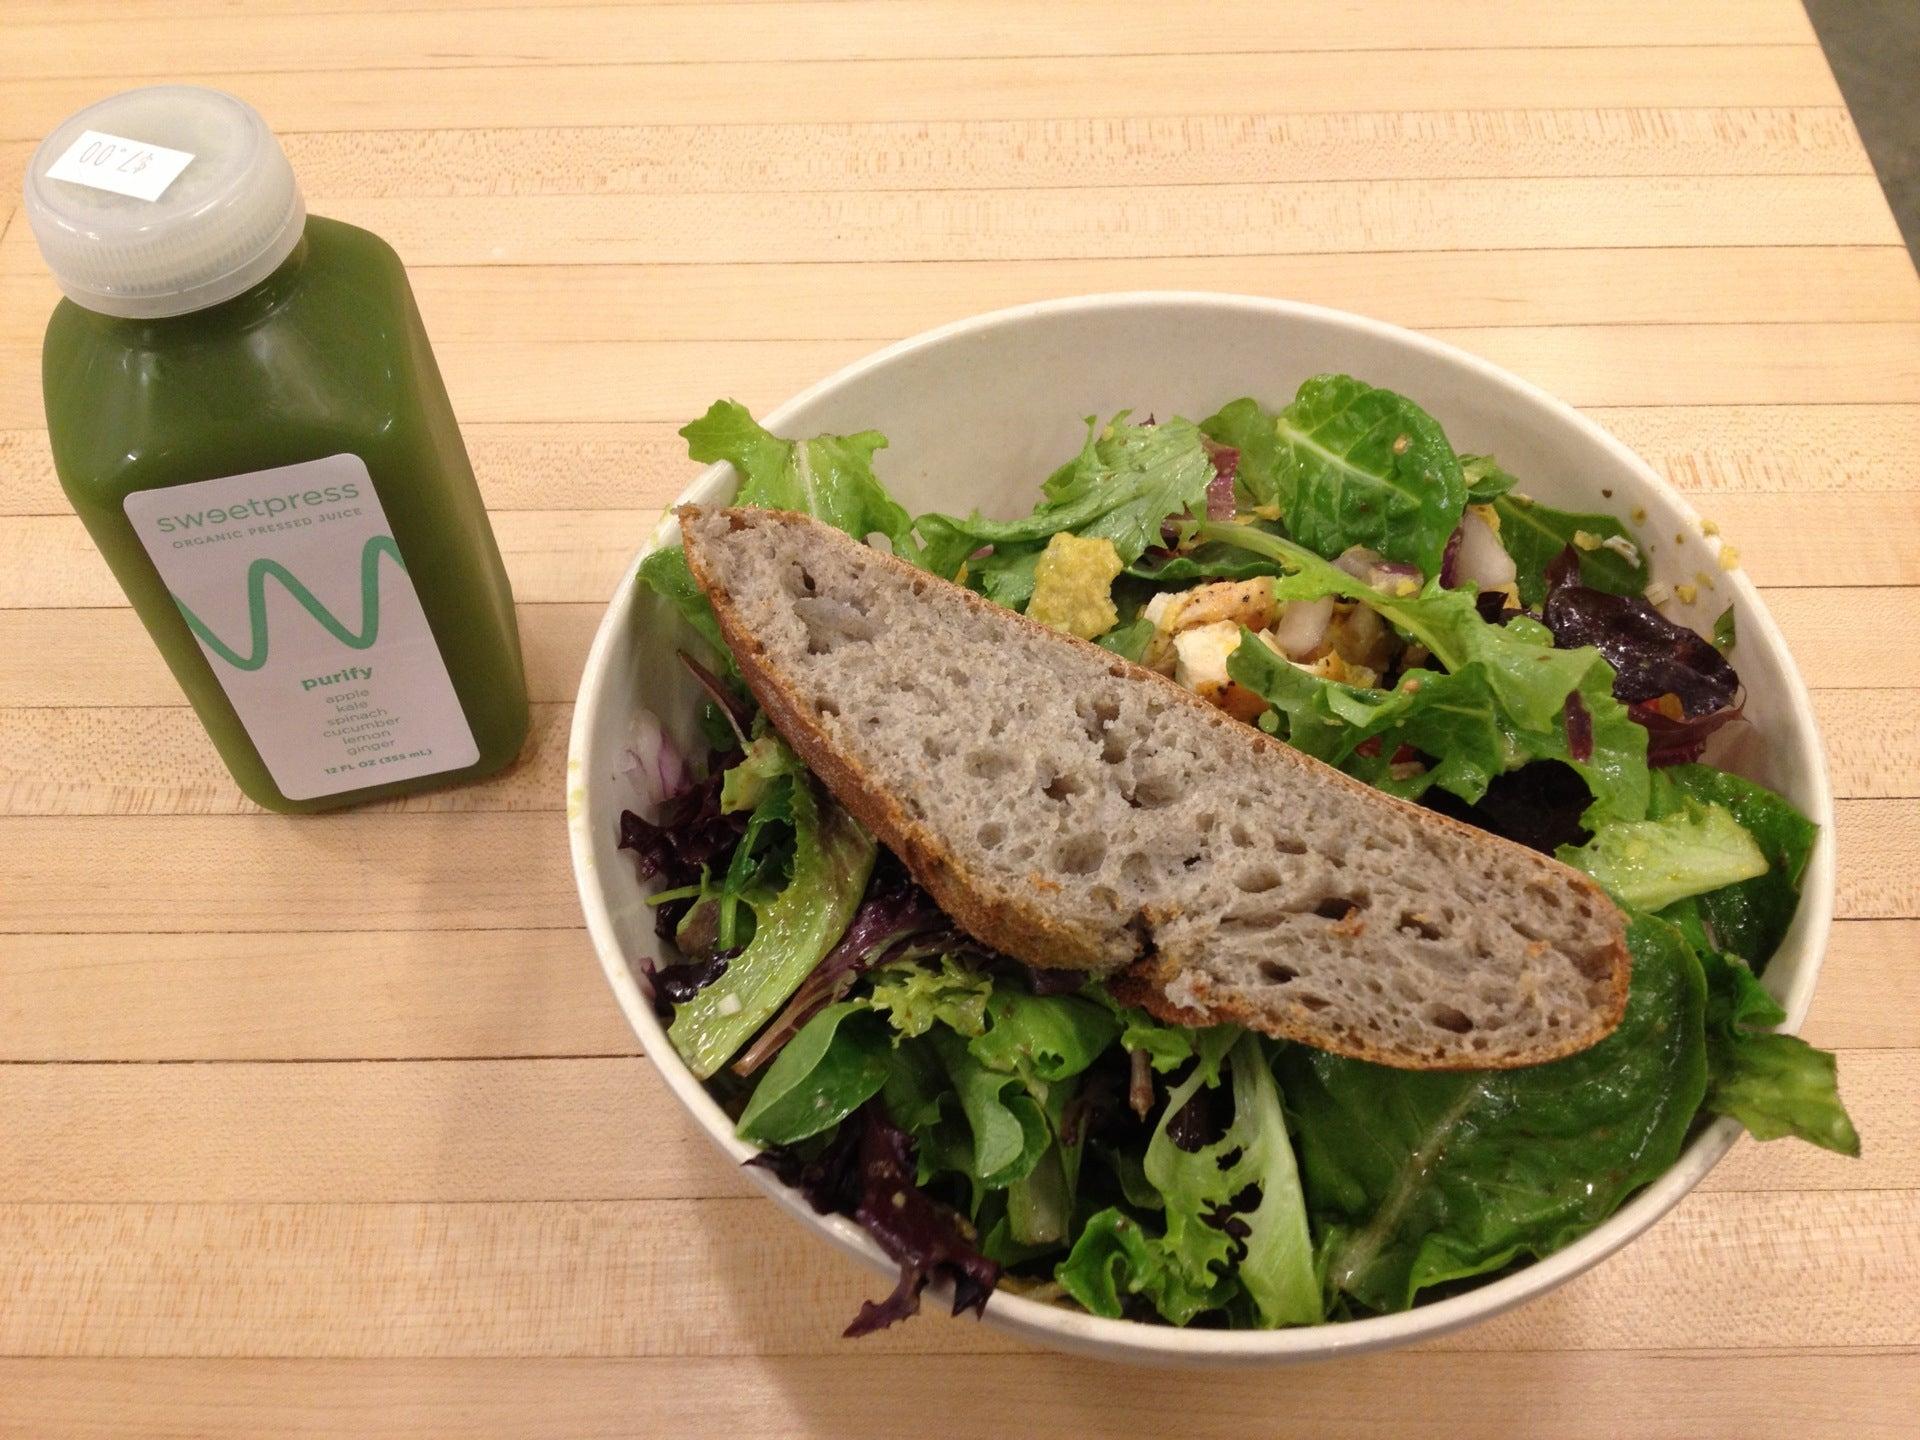 White apron dc nutrition - Foursquare